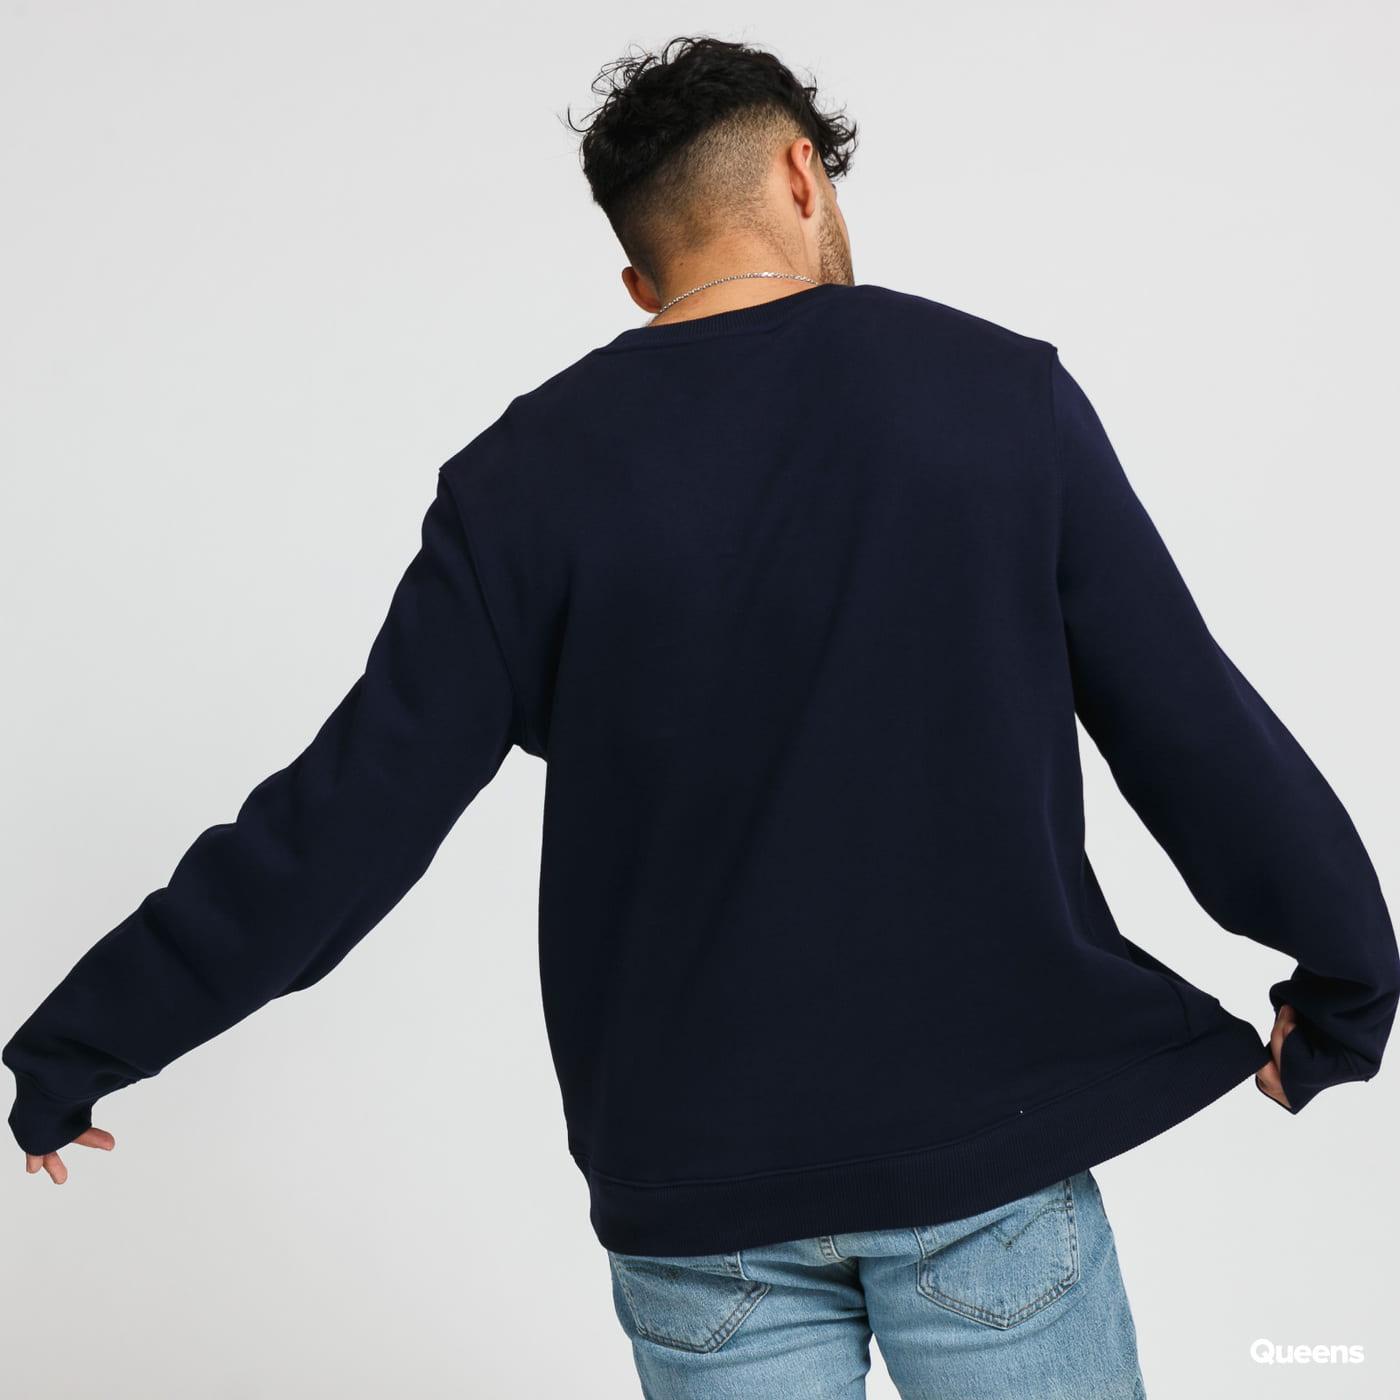 LACOSTE Men's Lacoste And Crocodile Branded Fleece Sweatshirt blue / turquoise